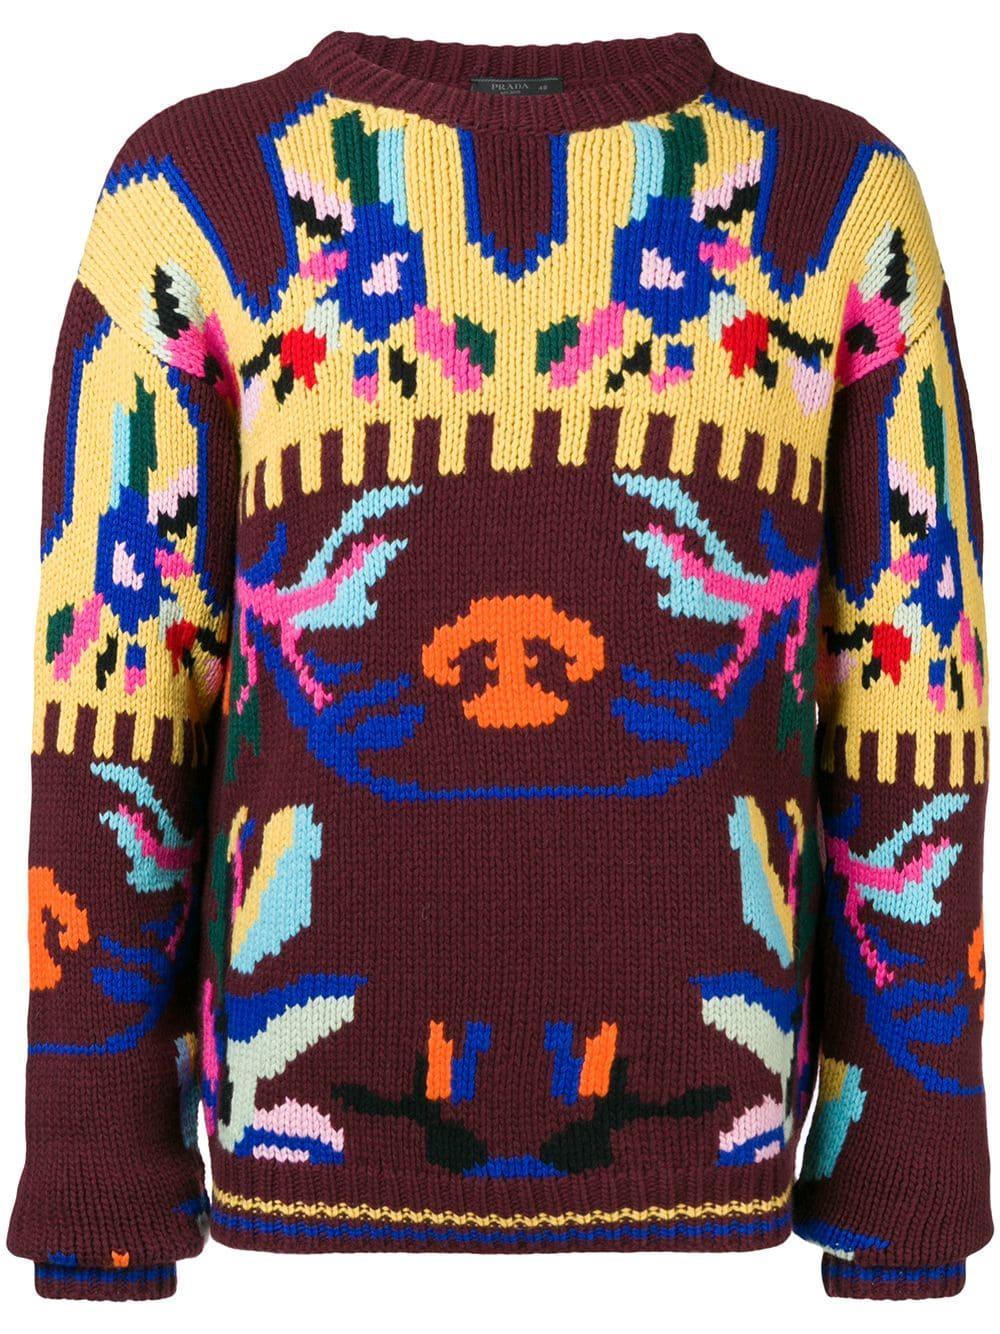 e94a1d70e542 Prada Intarsia Knit Sweater in Pink for Men - Lyst